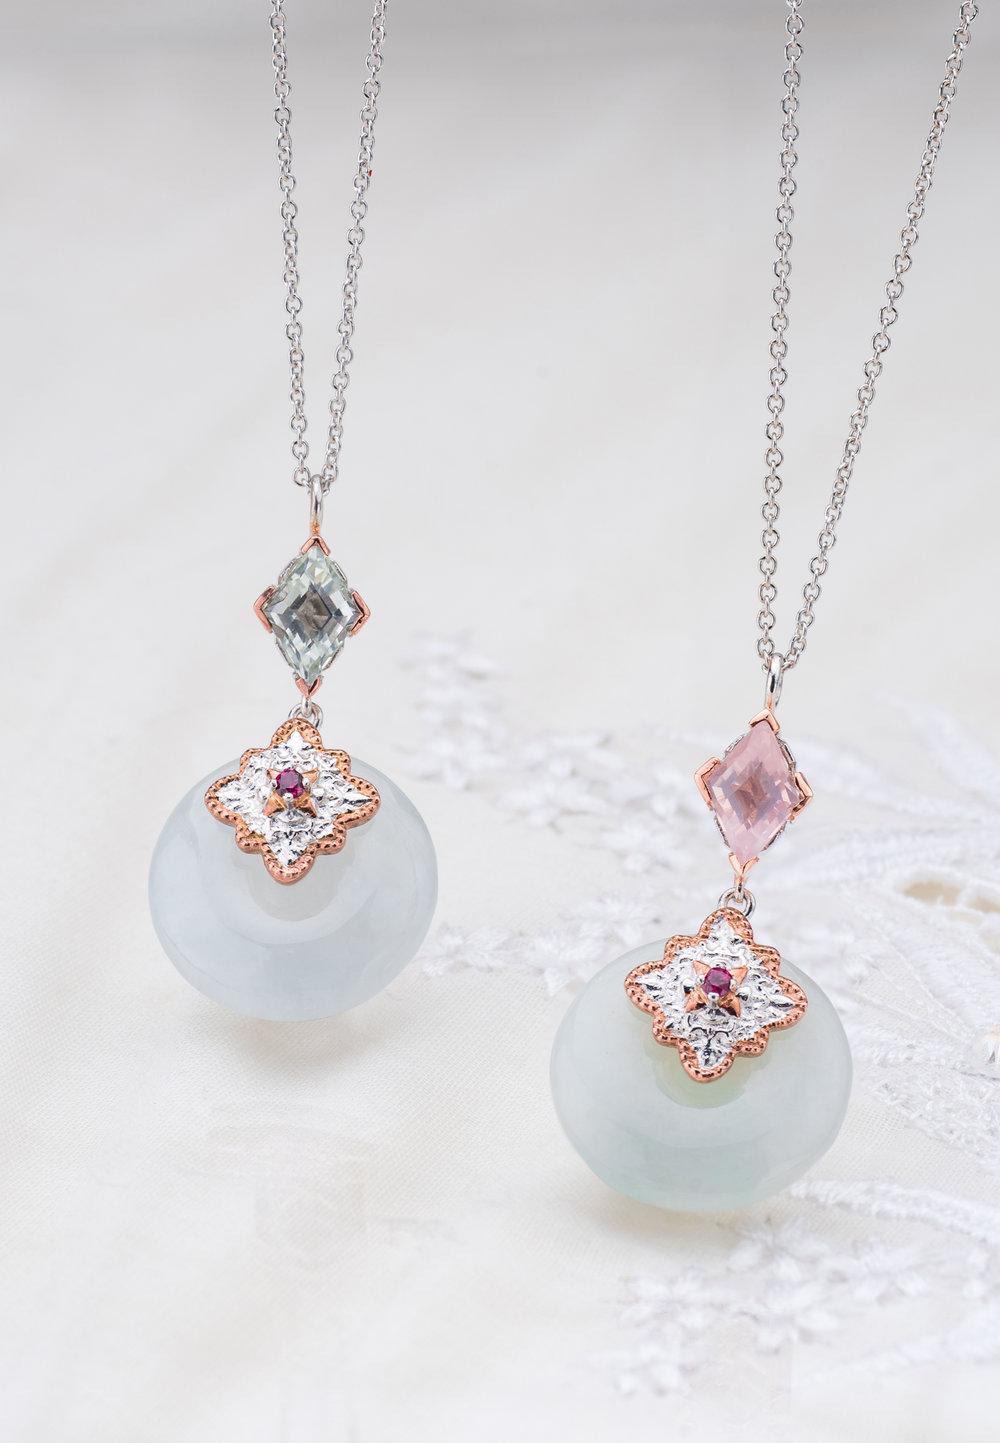 Choo Yilin Kebaya Jade Donut Necklace